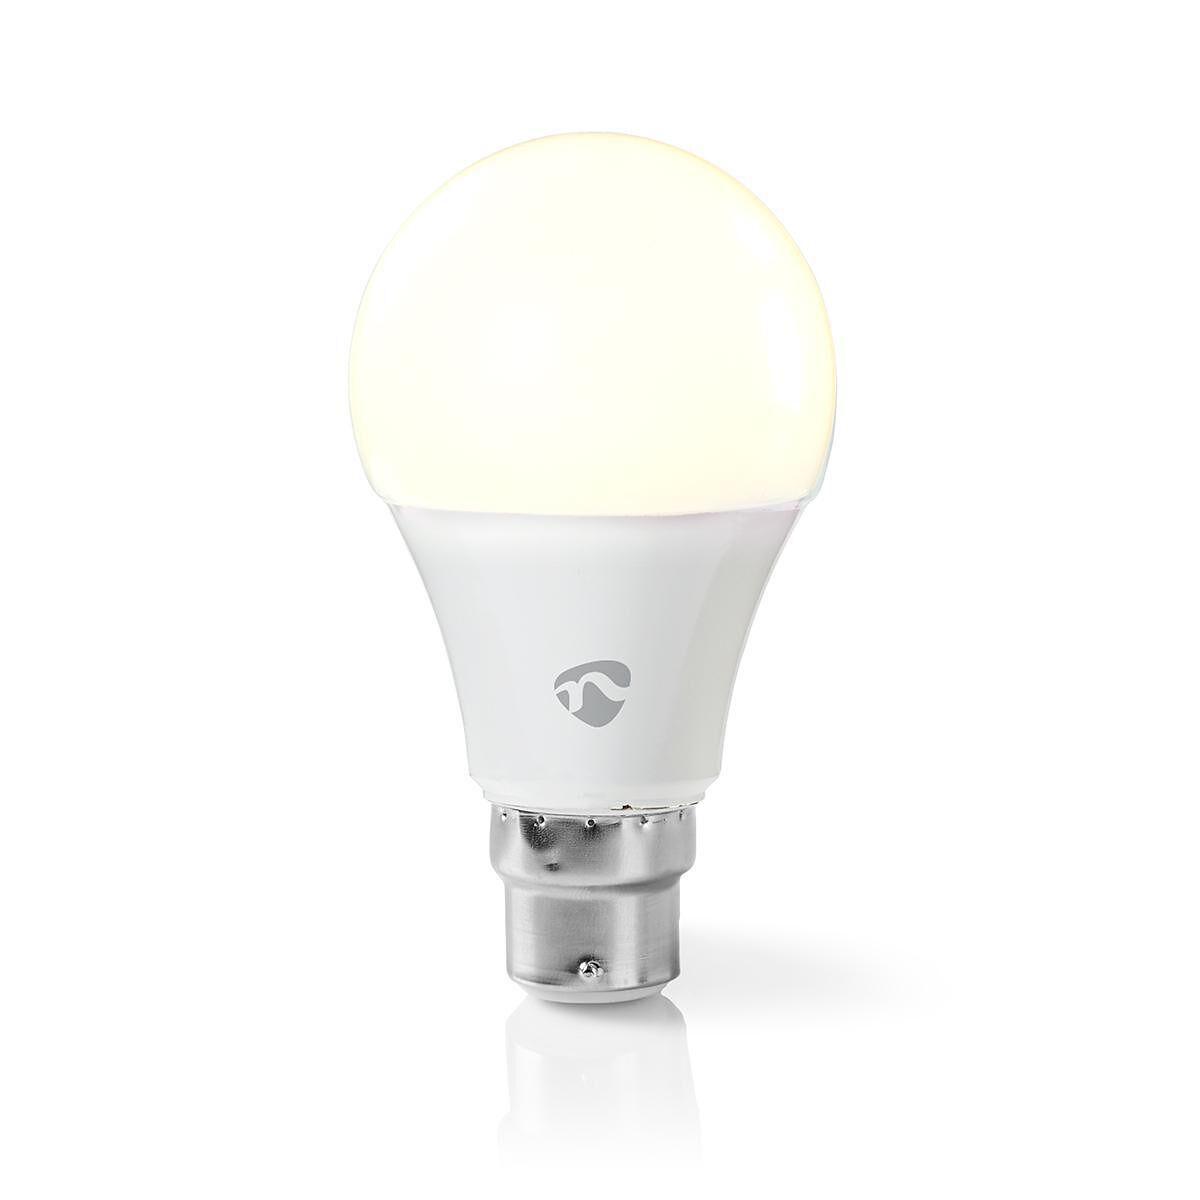 Nedis WiFi Smart LED-lampa B22 - Varmt till kallt vitt